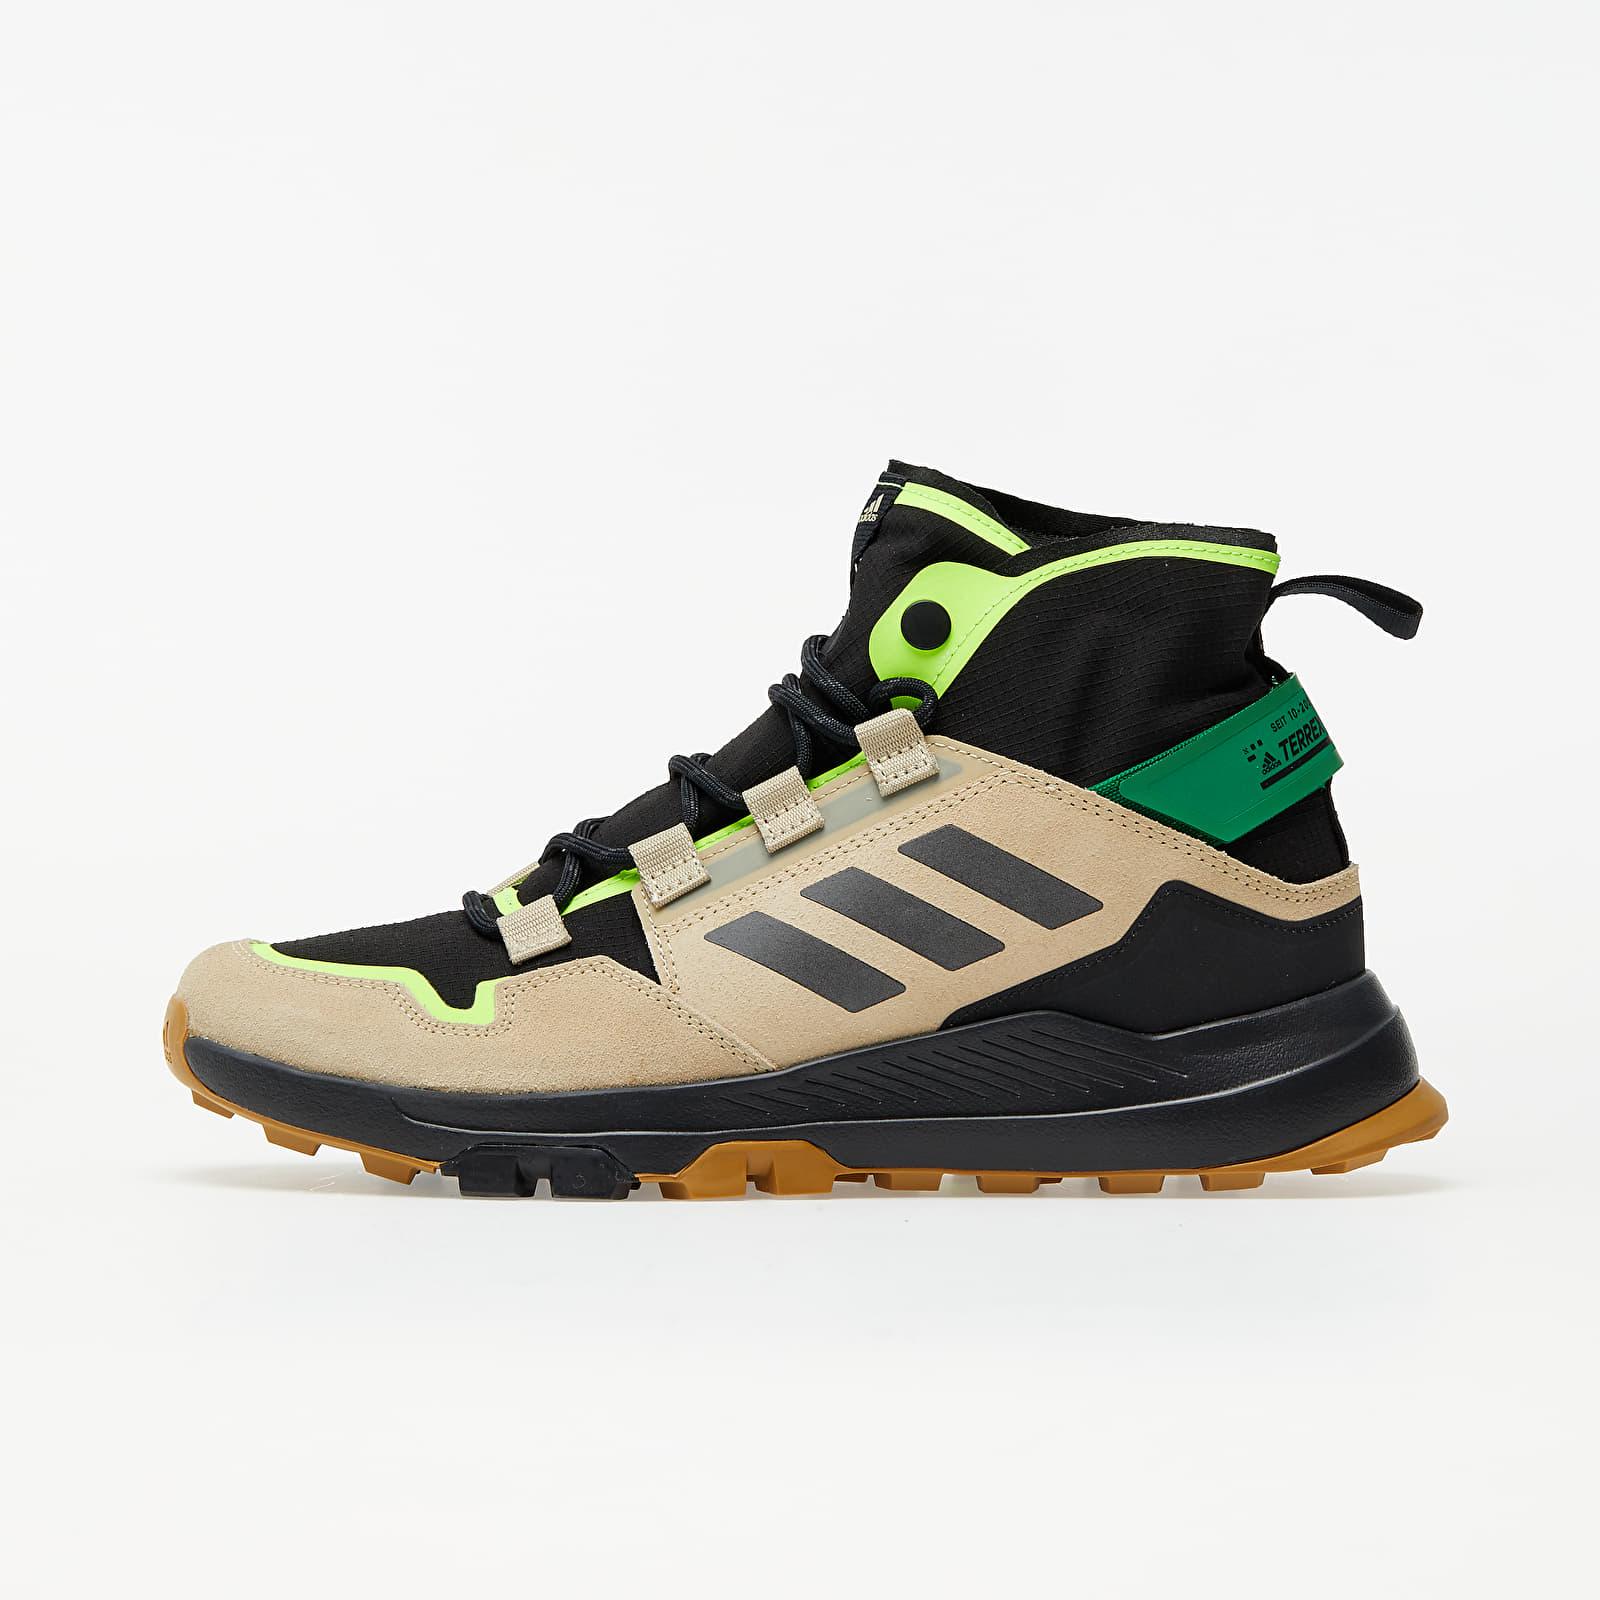 Мужская обувь adidas Terrex Hikster Mid Core Black/ Core Black/ Signature Green